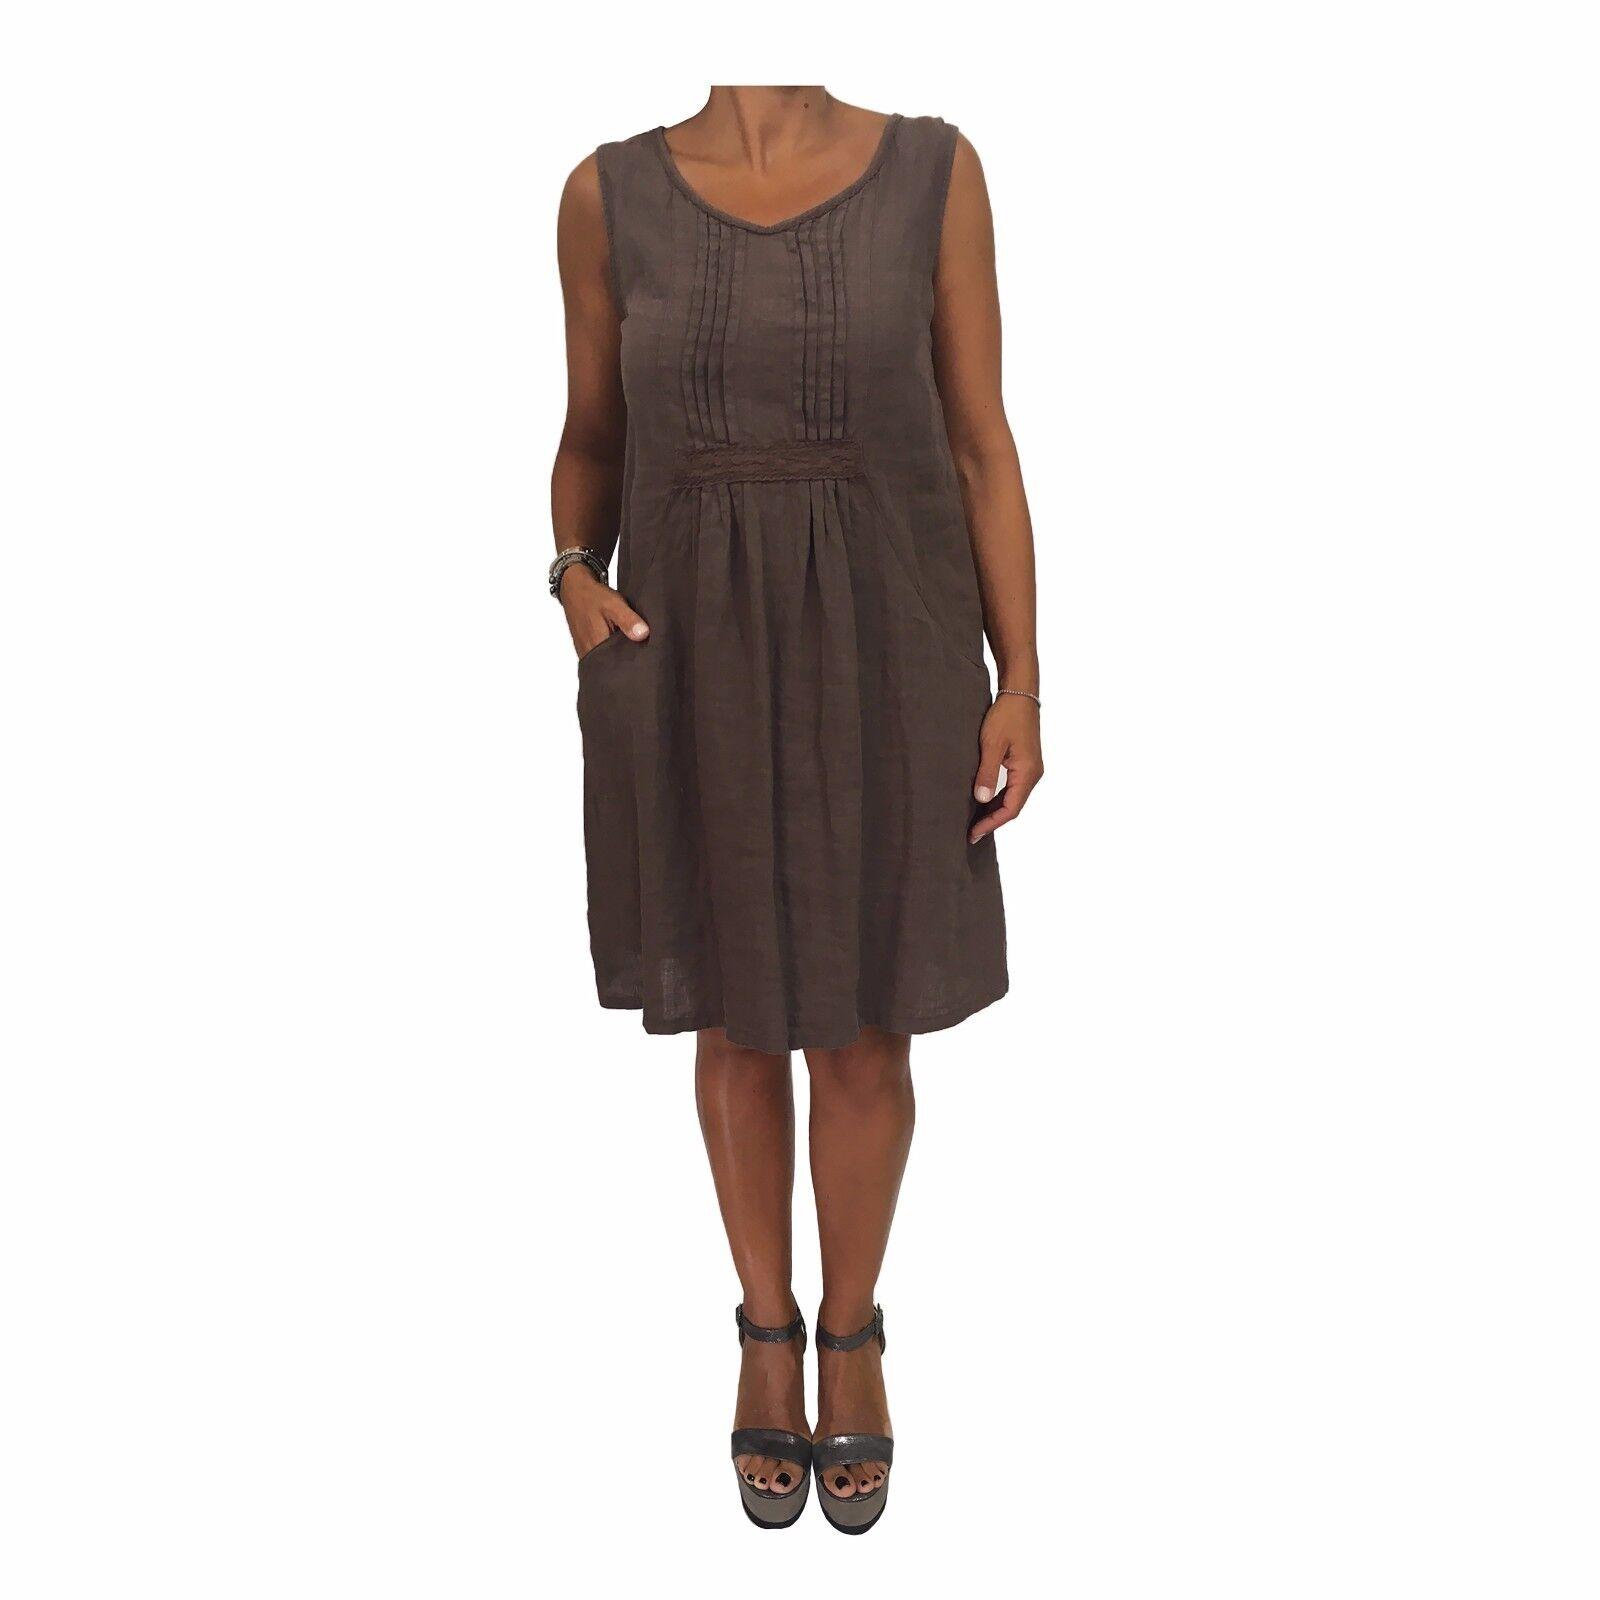 HUMILITY 1949 women's dress sleeveless dark brown 100% linen MADE IN ITALY